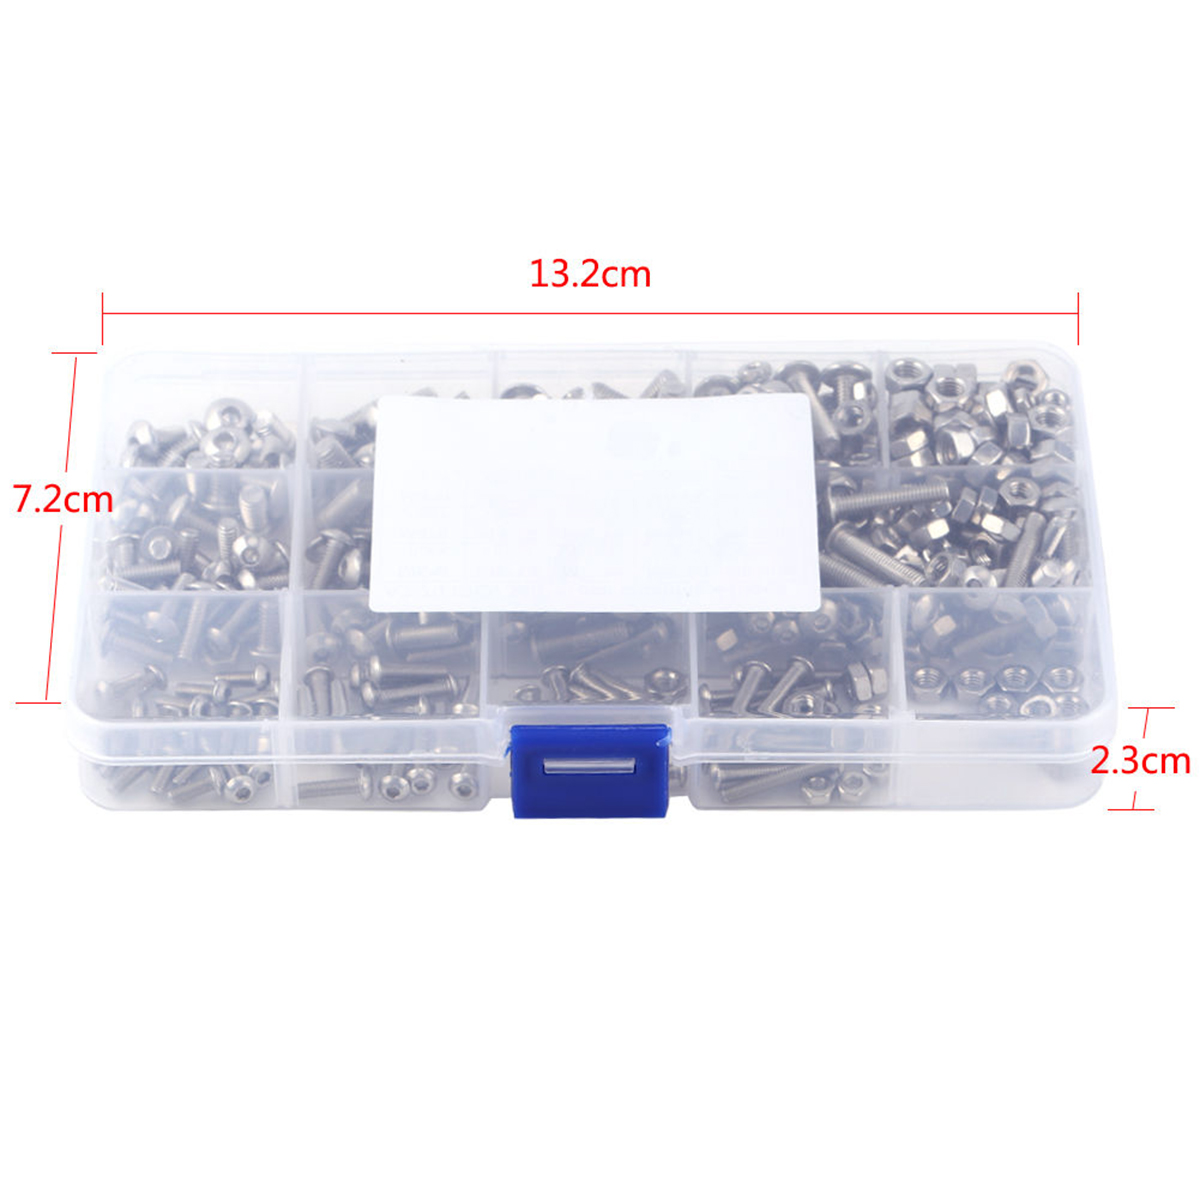 440pcs Stainless Steel Hex Socket Screws M3 M4 M5 Mayitr Button Head Bolts Nuts Kit with Plastic Box сандали cristhalia сандали